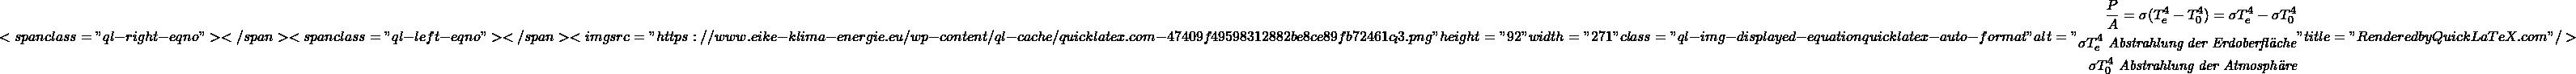 "\[<span class=""ql-right-eqno"">   </span><span class=""ql-left-eqno"">   </span><img src=""https://www.eike-klima-energie.eu/wp-content/ql-cache/quicklatex.com-47409f49598312882be8ce89fb72461c_l3.png"" height=""92"" width=""271"" class=""ql-img-displayed-equation quicklatex-auto-format"" alt=""\begin{align*} \frac{P}{A} = \sigma(T_e^4-T_0^4) = \sigma T_e^4 - \sigma T_0^4 \\ \sigma T_e^4 \textit{ Abstrahlung der Erdoberfläche} \\ \sigma T_0^4 \textit{ Abstrahlung der Atmosphäre} \end{align*}"" title=""Rendered by QuickLaTeX.com""/>\]"